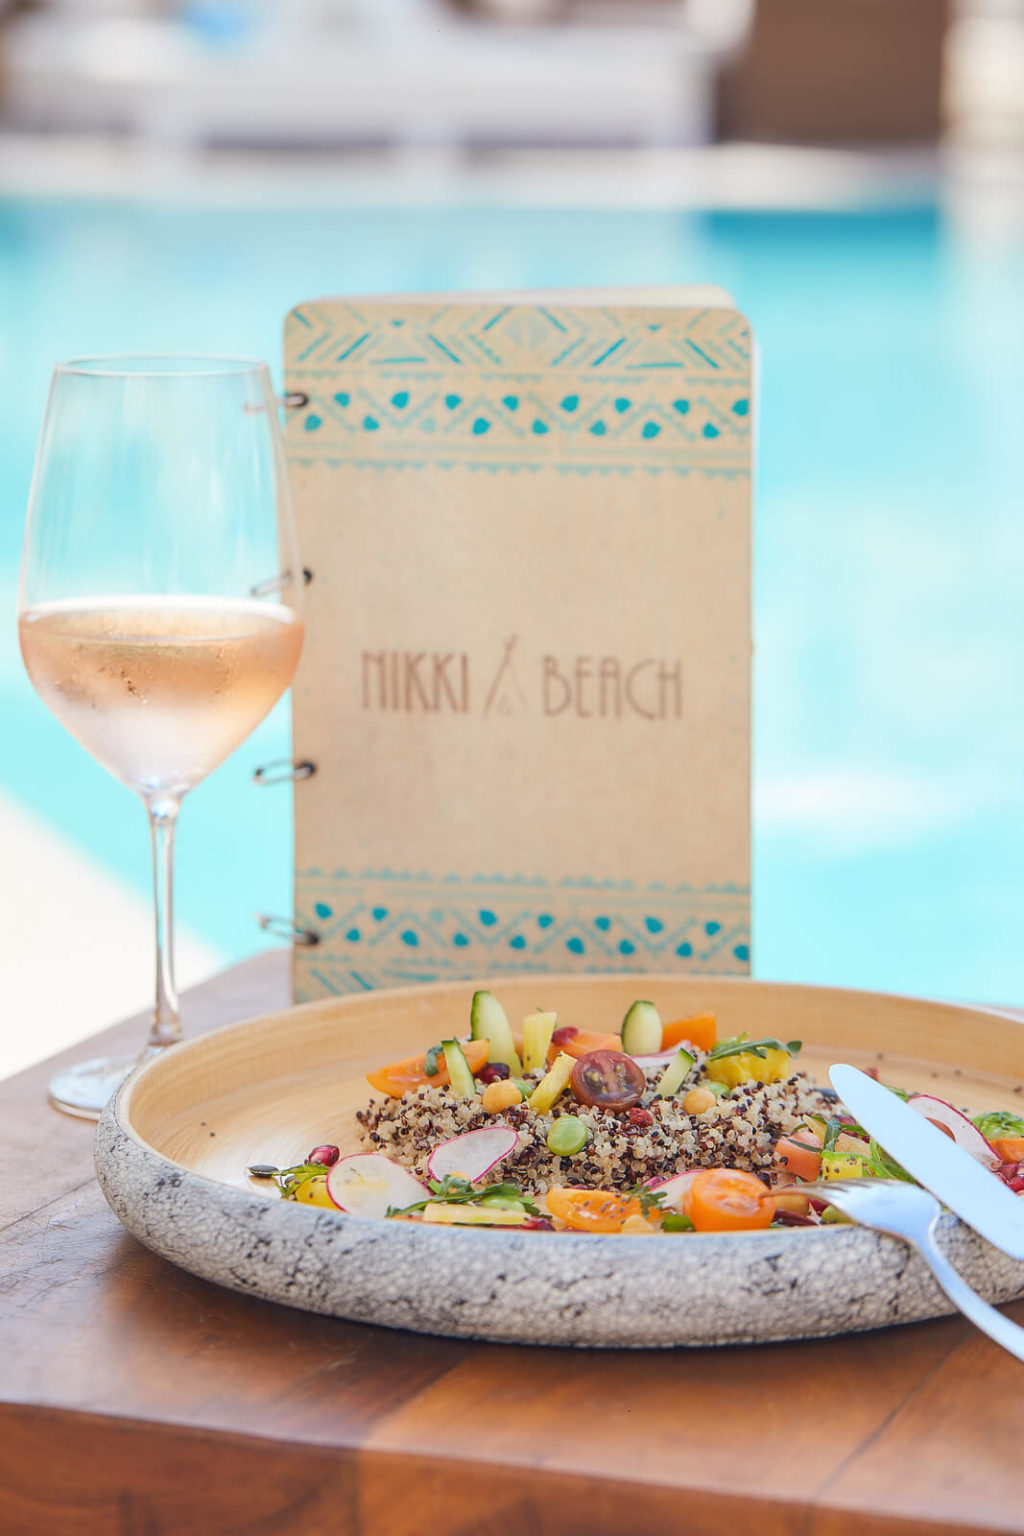 https://www.white-ibiza.com/wp-content/uploads/2020/03/white-ibiza-restaurants-nikki-beach-ibiza-2020-04-1024x1536.jpg